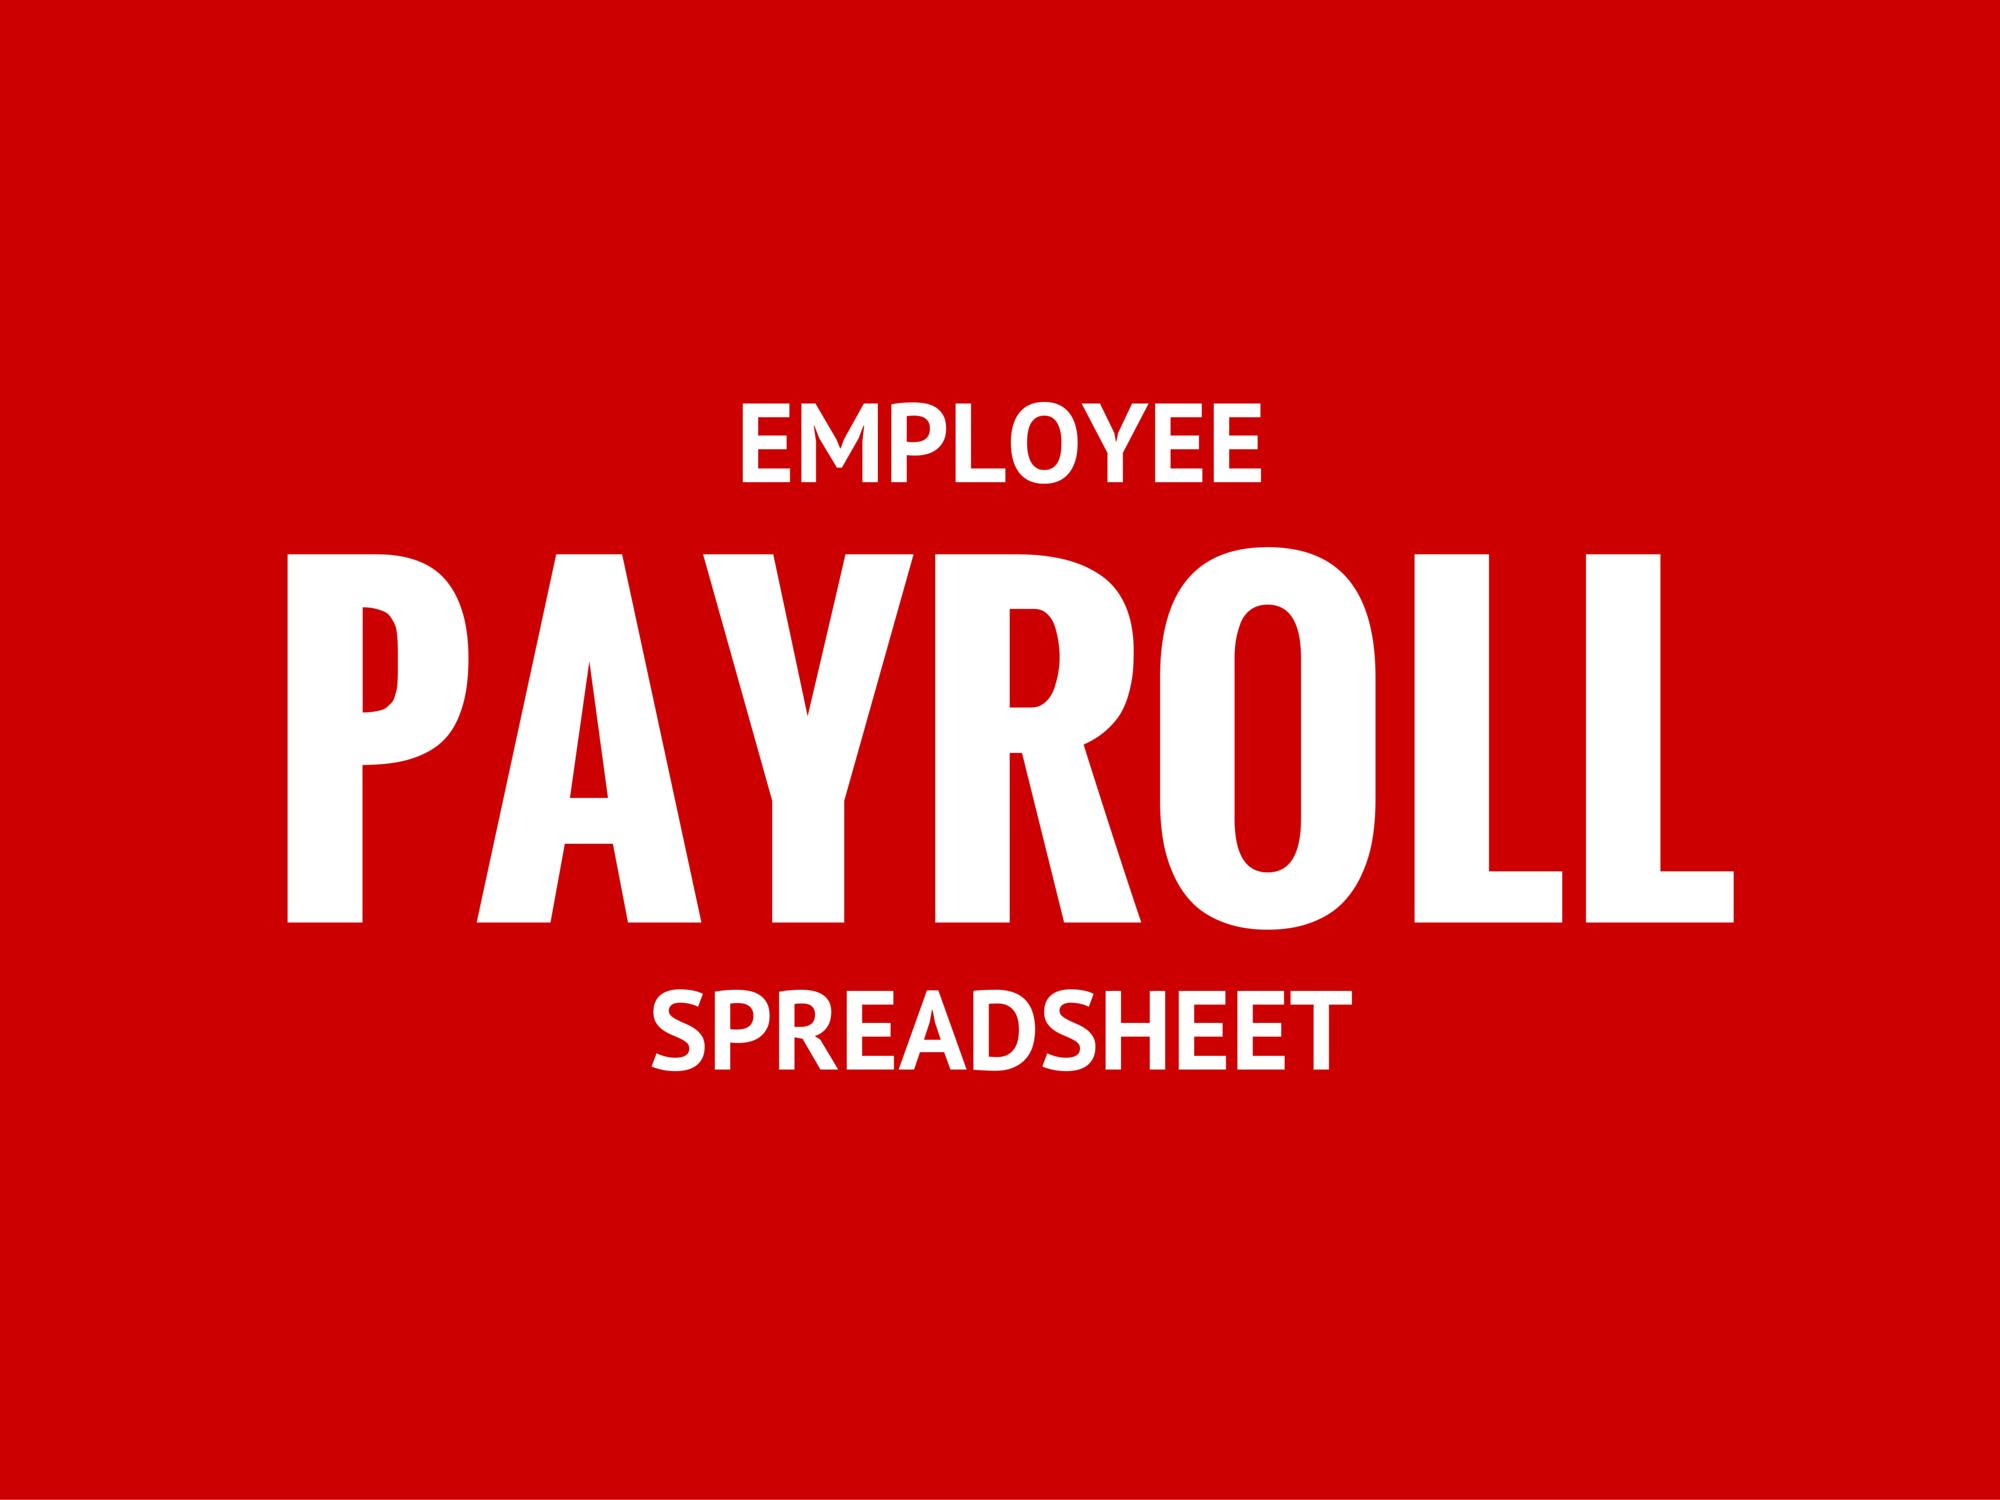 employee payroll spreadsheet